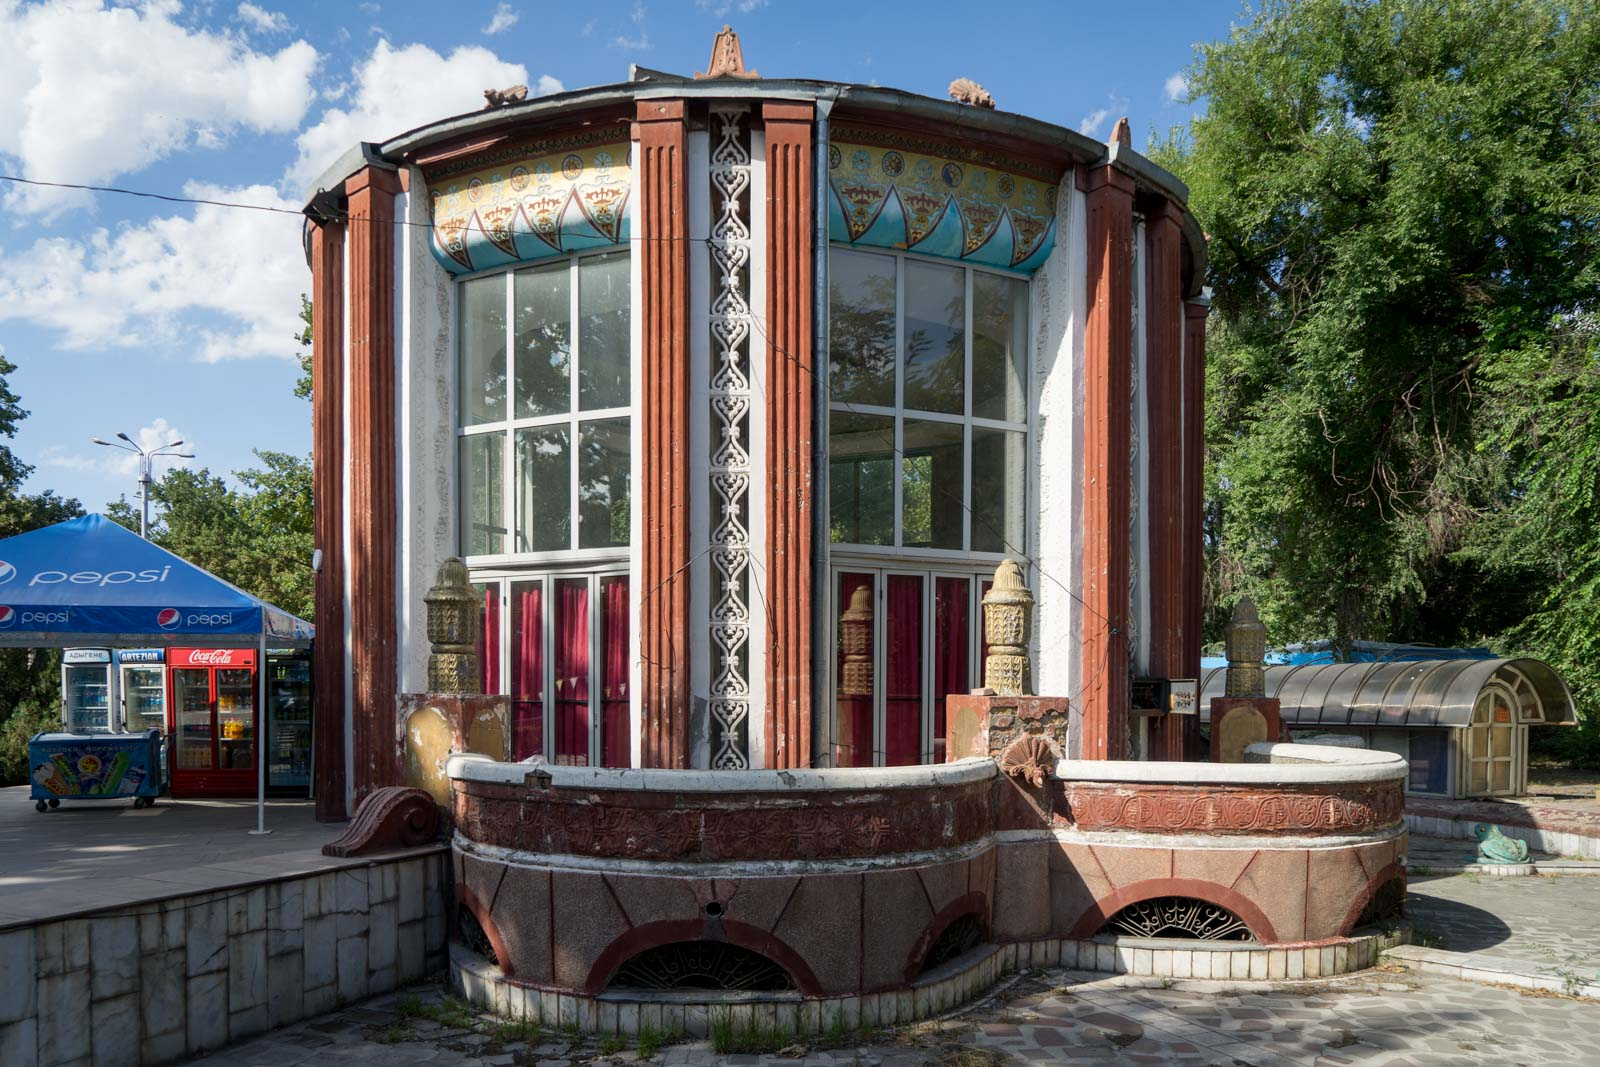 Soda Shop, Bishkek, Kyrgyzstan